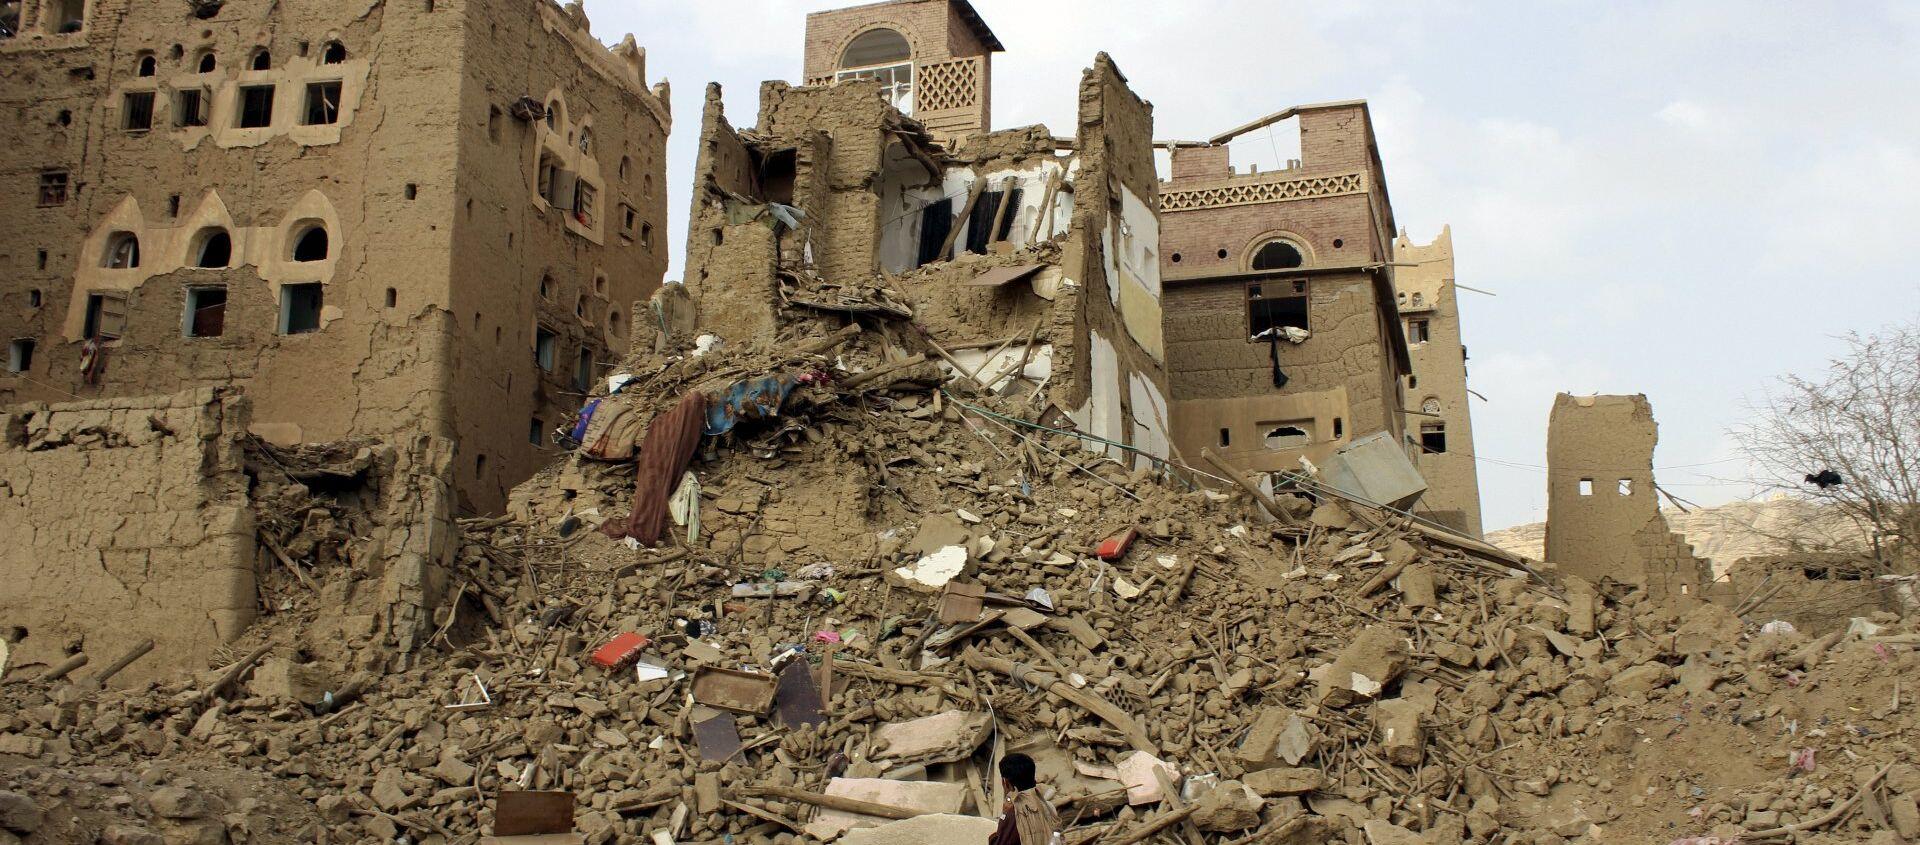 Situación en Yemen (Archivo) - Sputnik Mundo, 1920, 07.02.2021